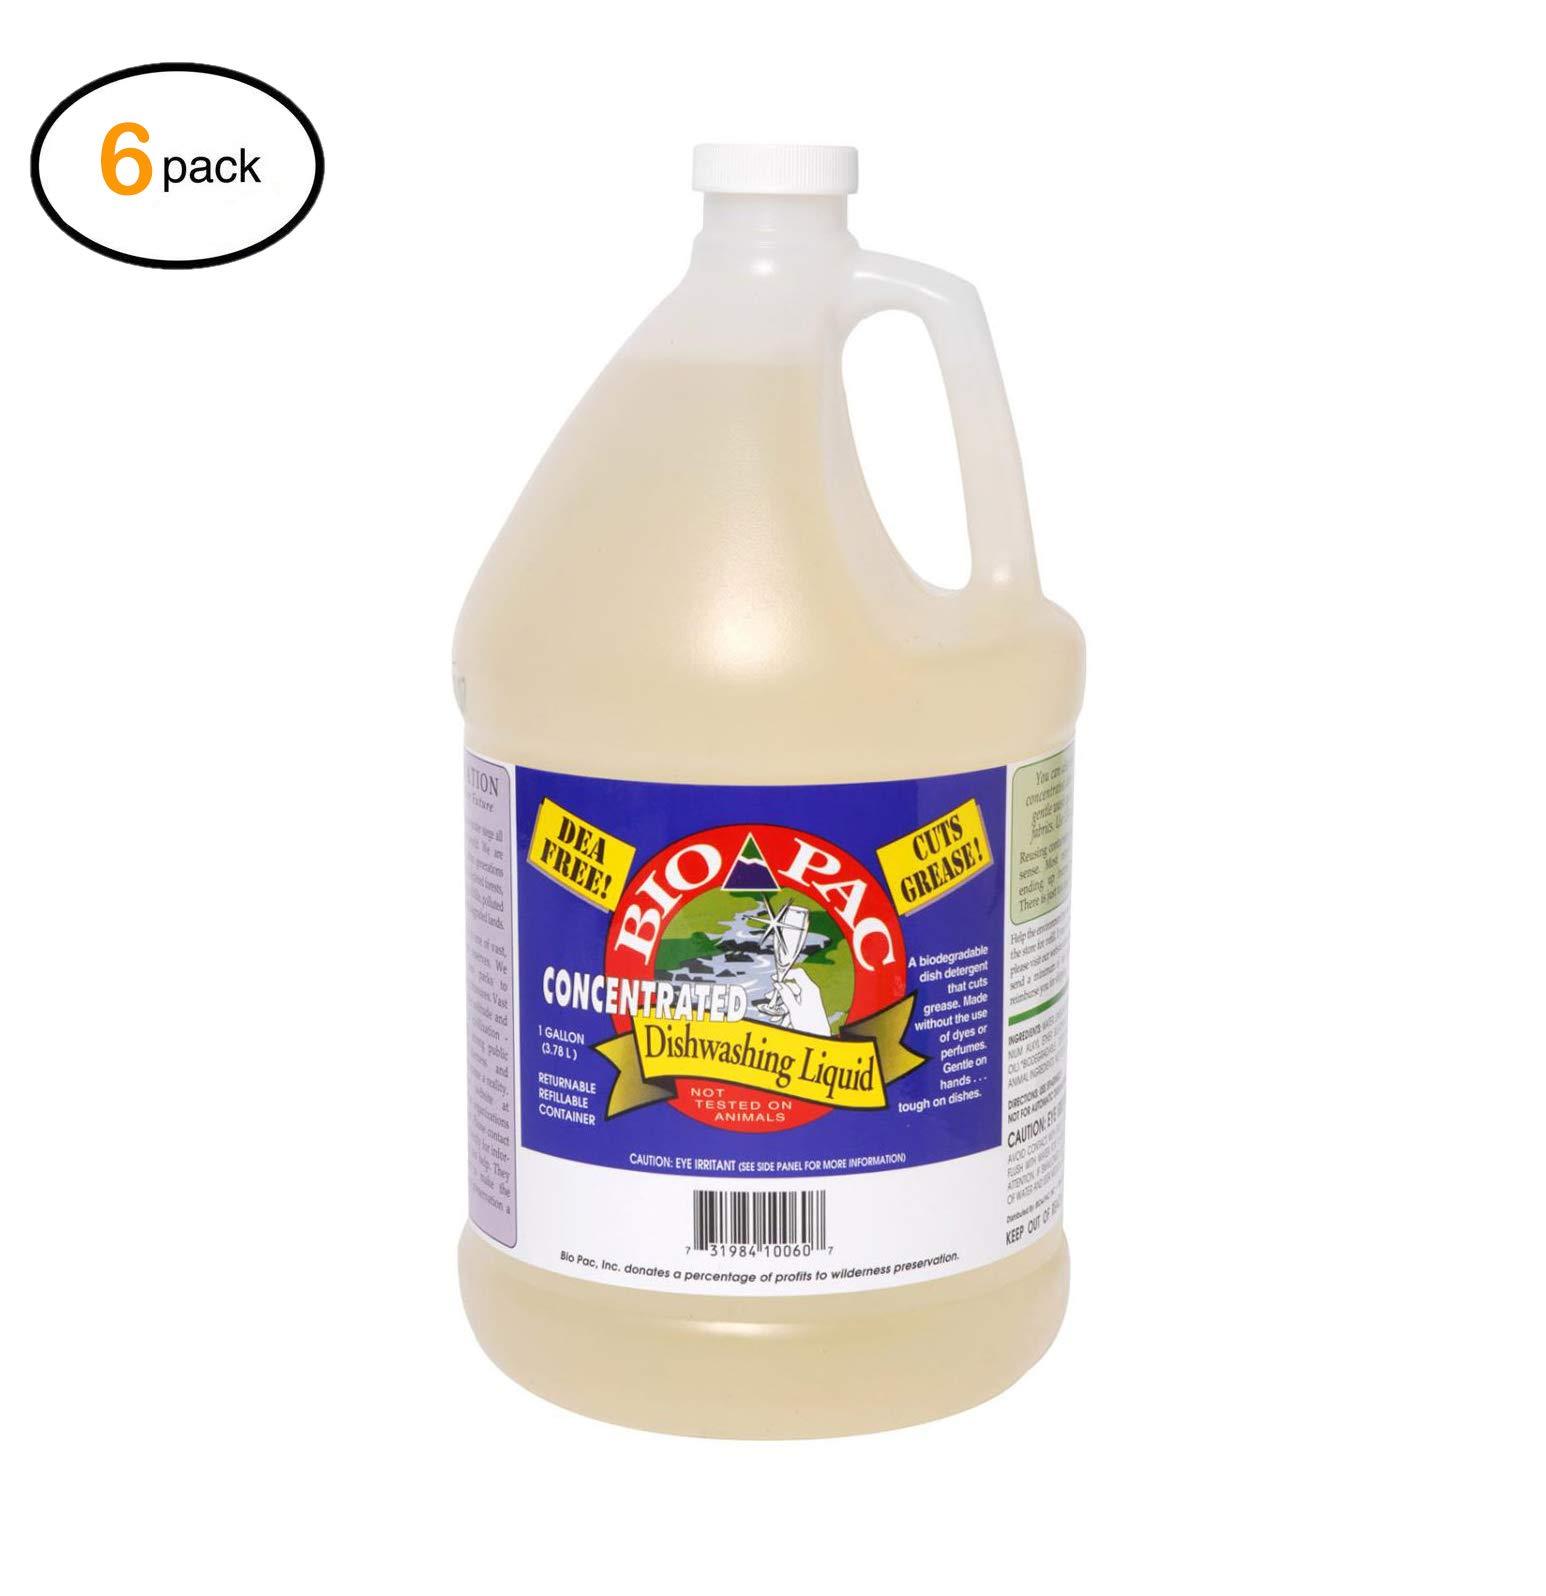 Biо-Pac Dishwashing Liquid - Cоncеntratеd - Casе оf 6-1 Gal - Bulk Buy